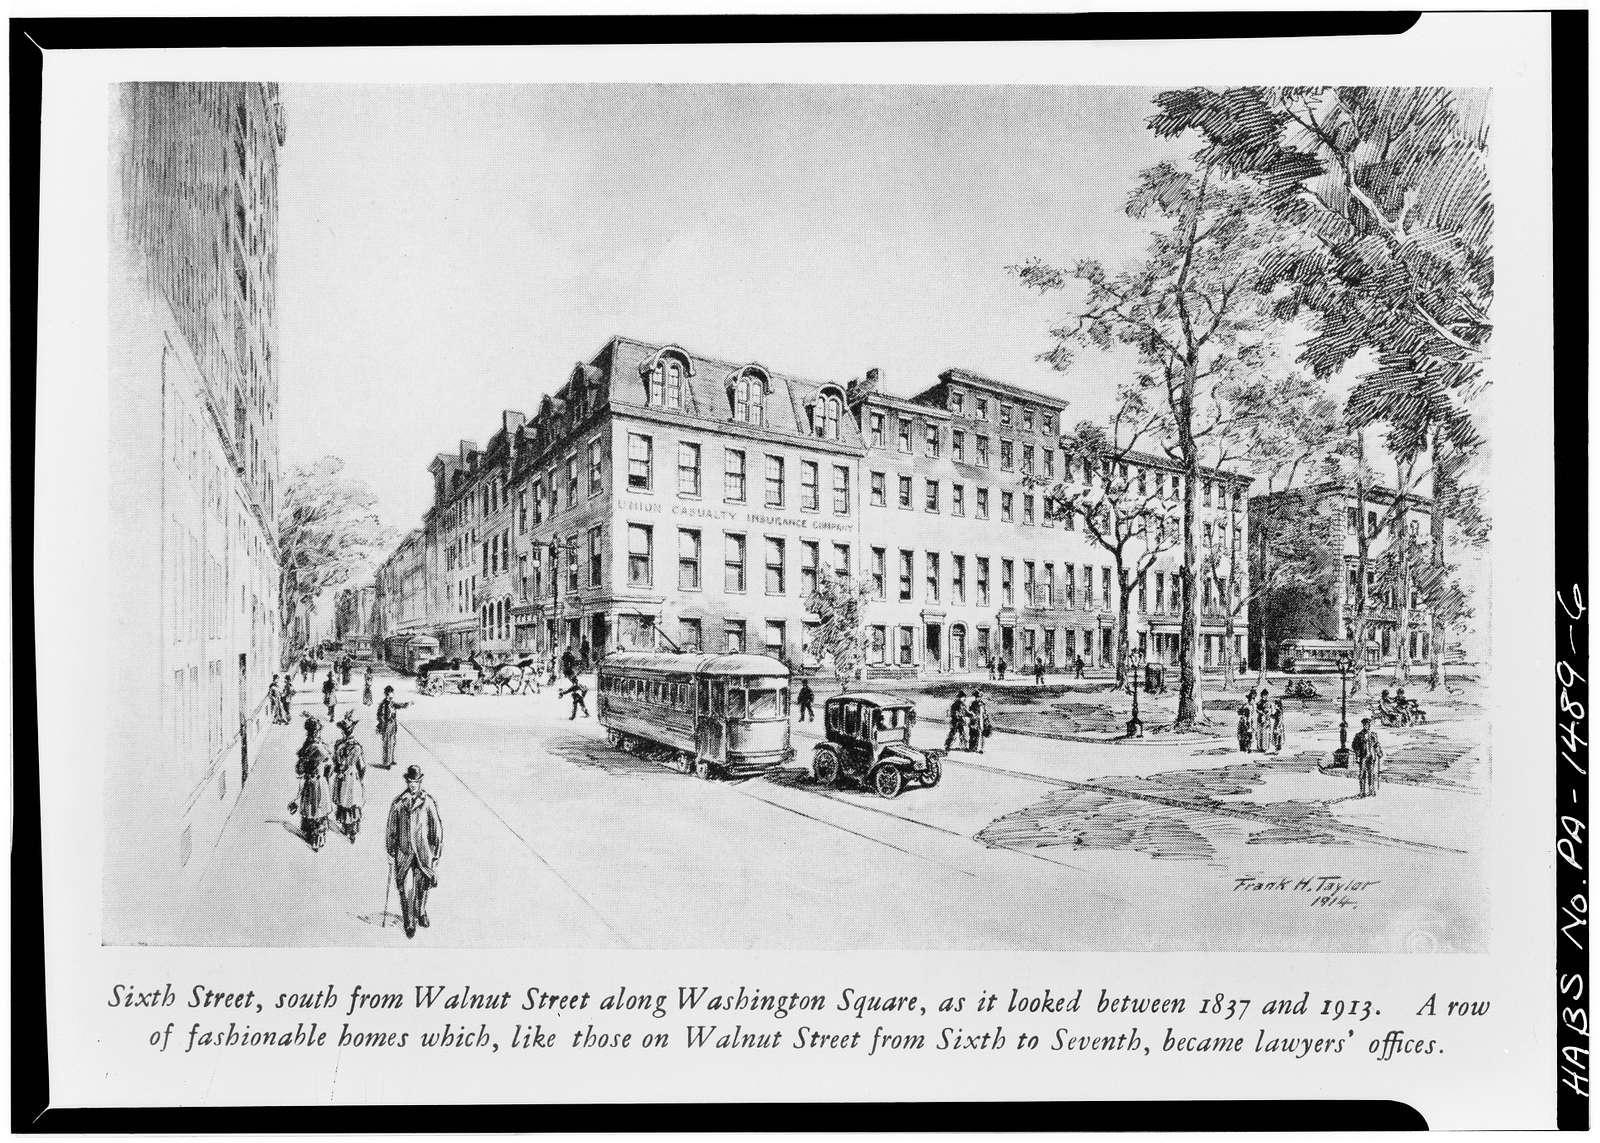 Washington Square Area Study, Sixth, Seventh, Walnut & Locust Streets, Philadelphia, Philadelphia County, PA